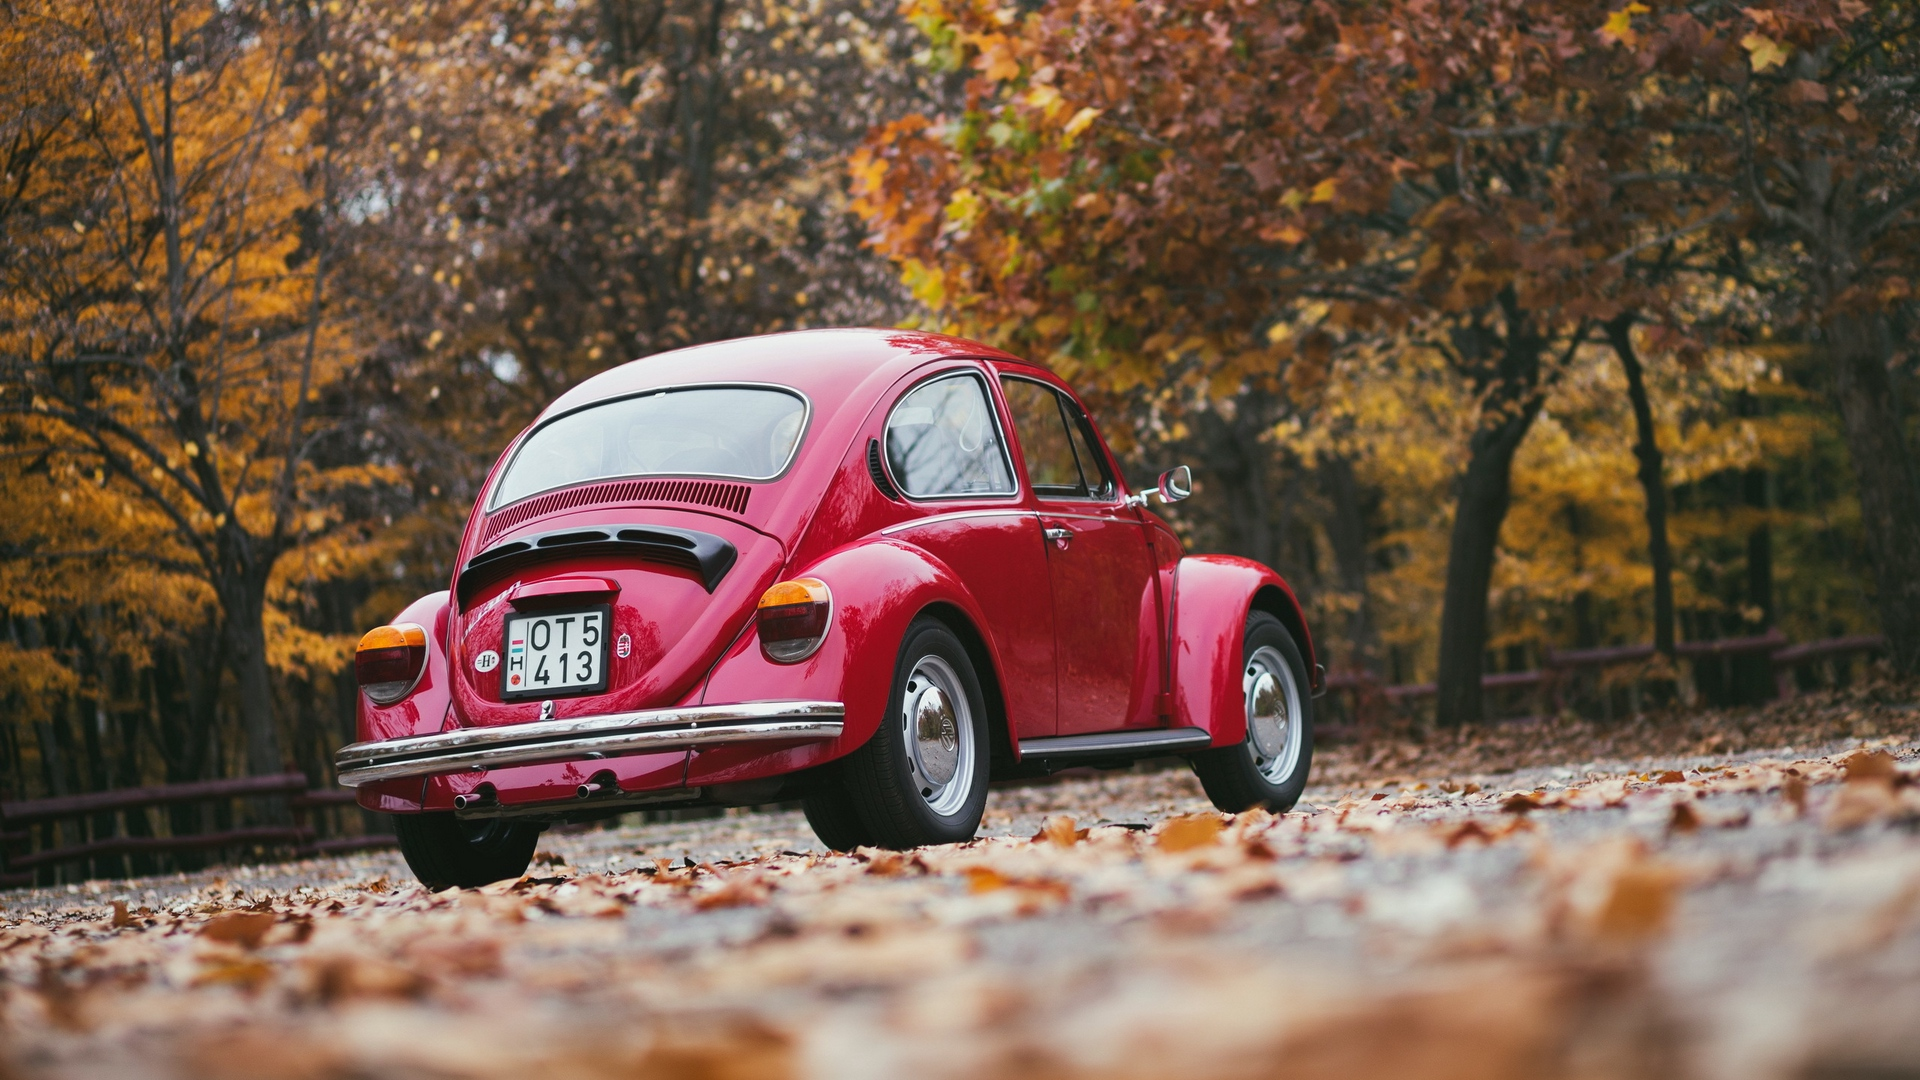 Download wallpaper 1920x1080 volkswagen red rear view full hd 1920x1080